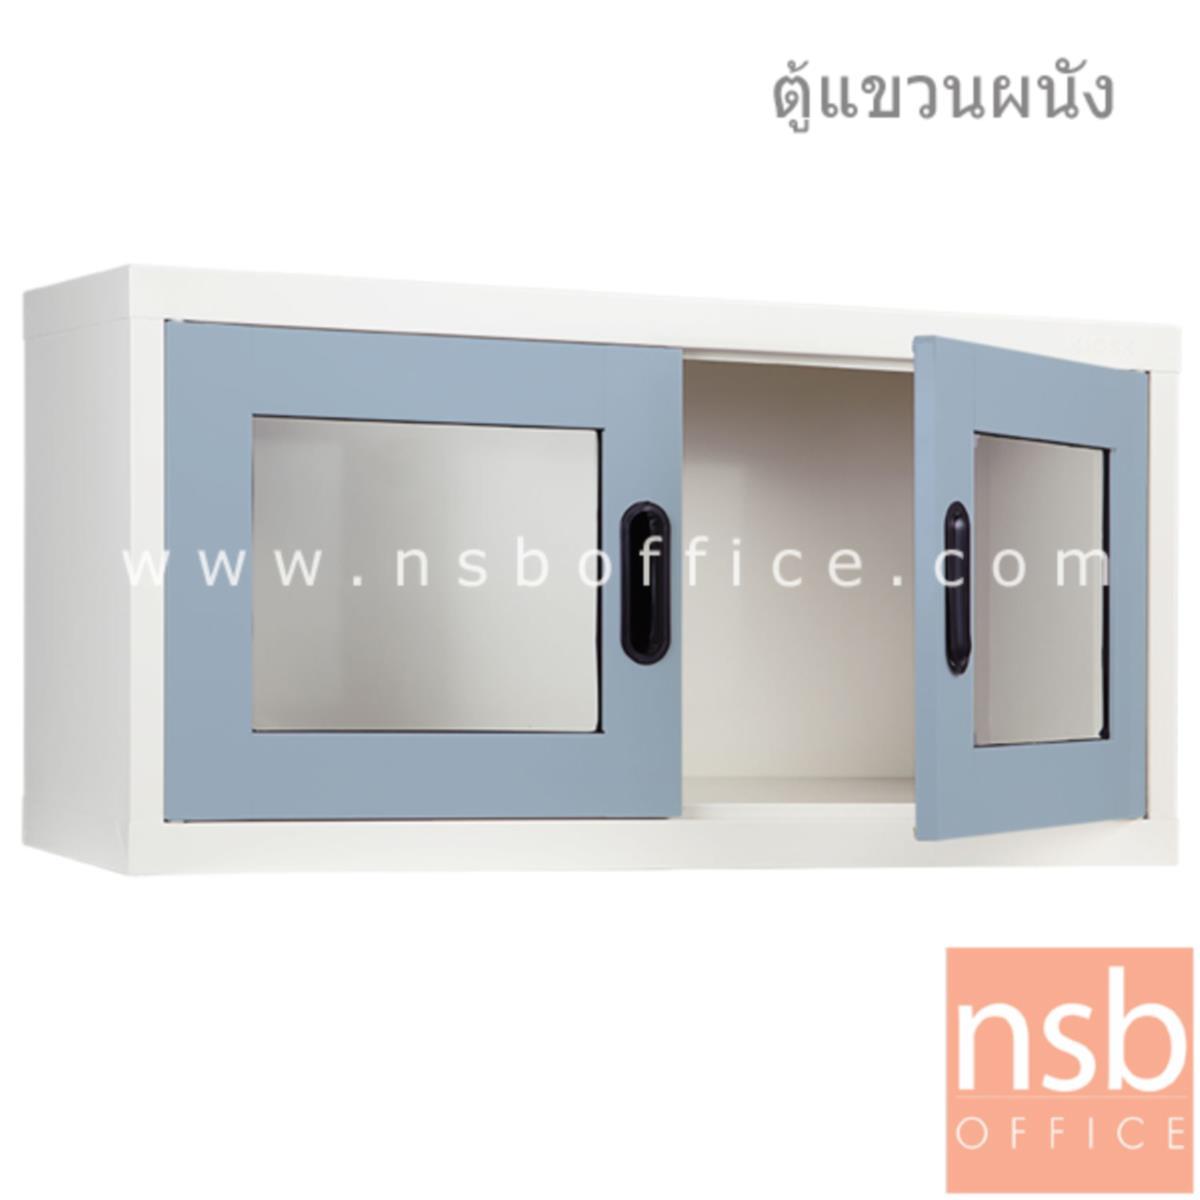 E25A019:ตู้เหล็กแขวนลอย 2 บานเปิดกระจก  รุ่น MAX-012 ขนาด 88W*44H cm.